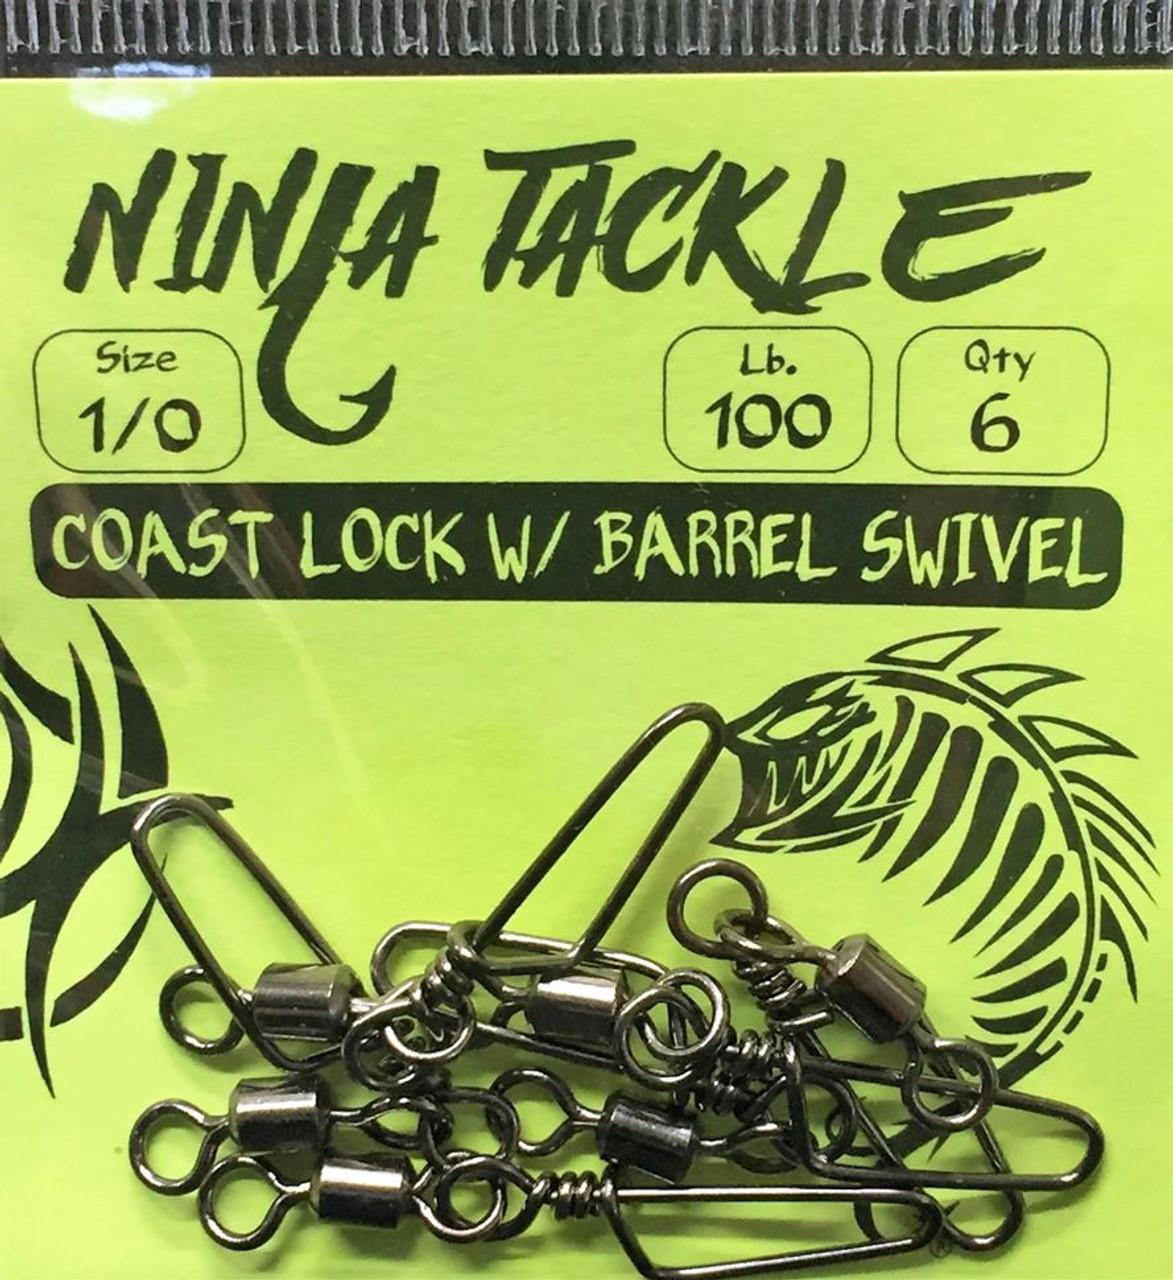 Ninja Tackle 1/0 Coast Lock with Barrel Swivel